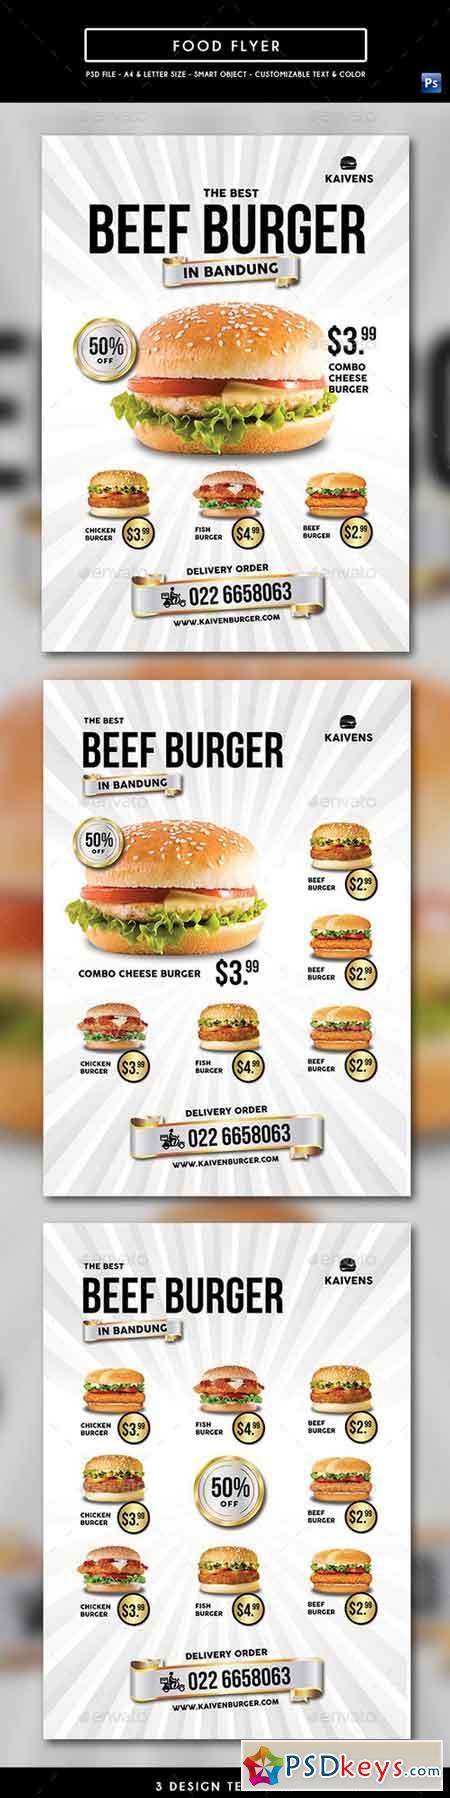 Food Flyer 16824017